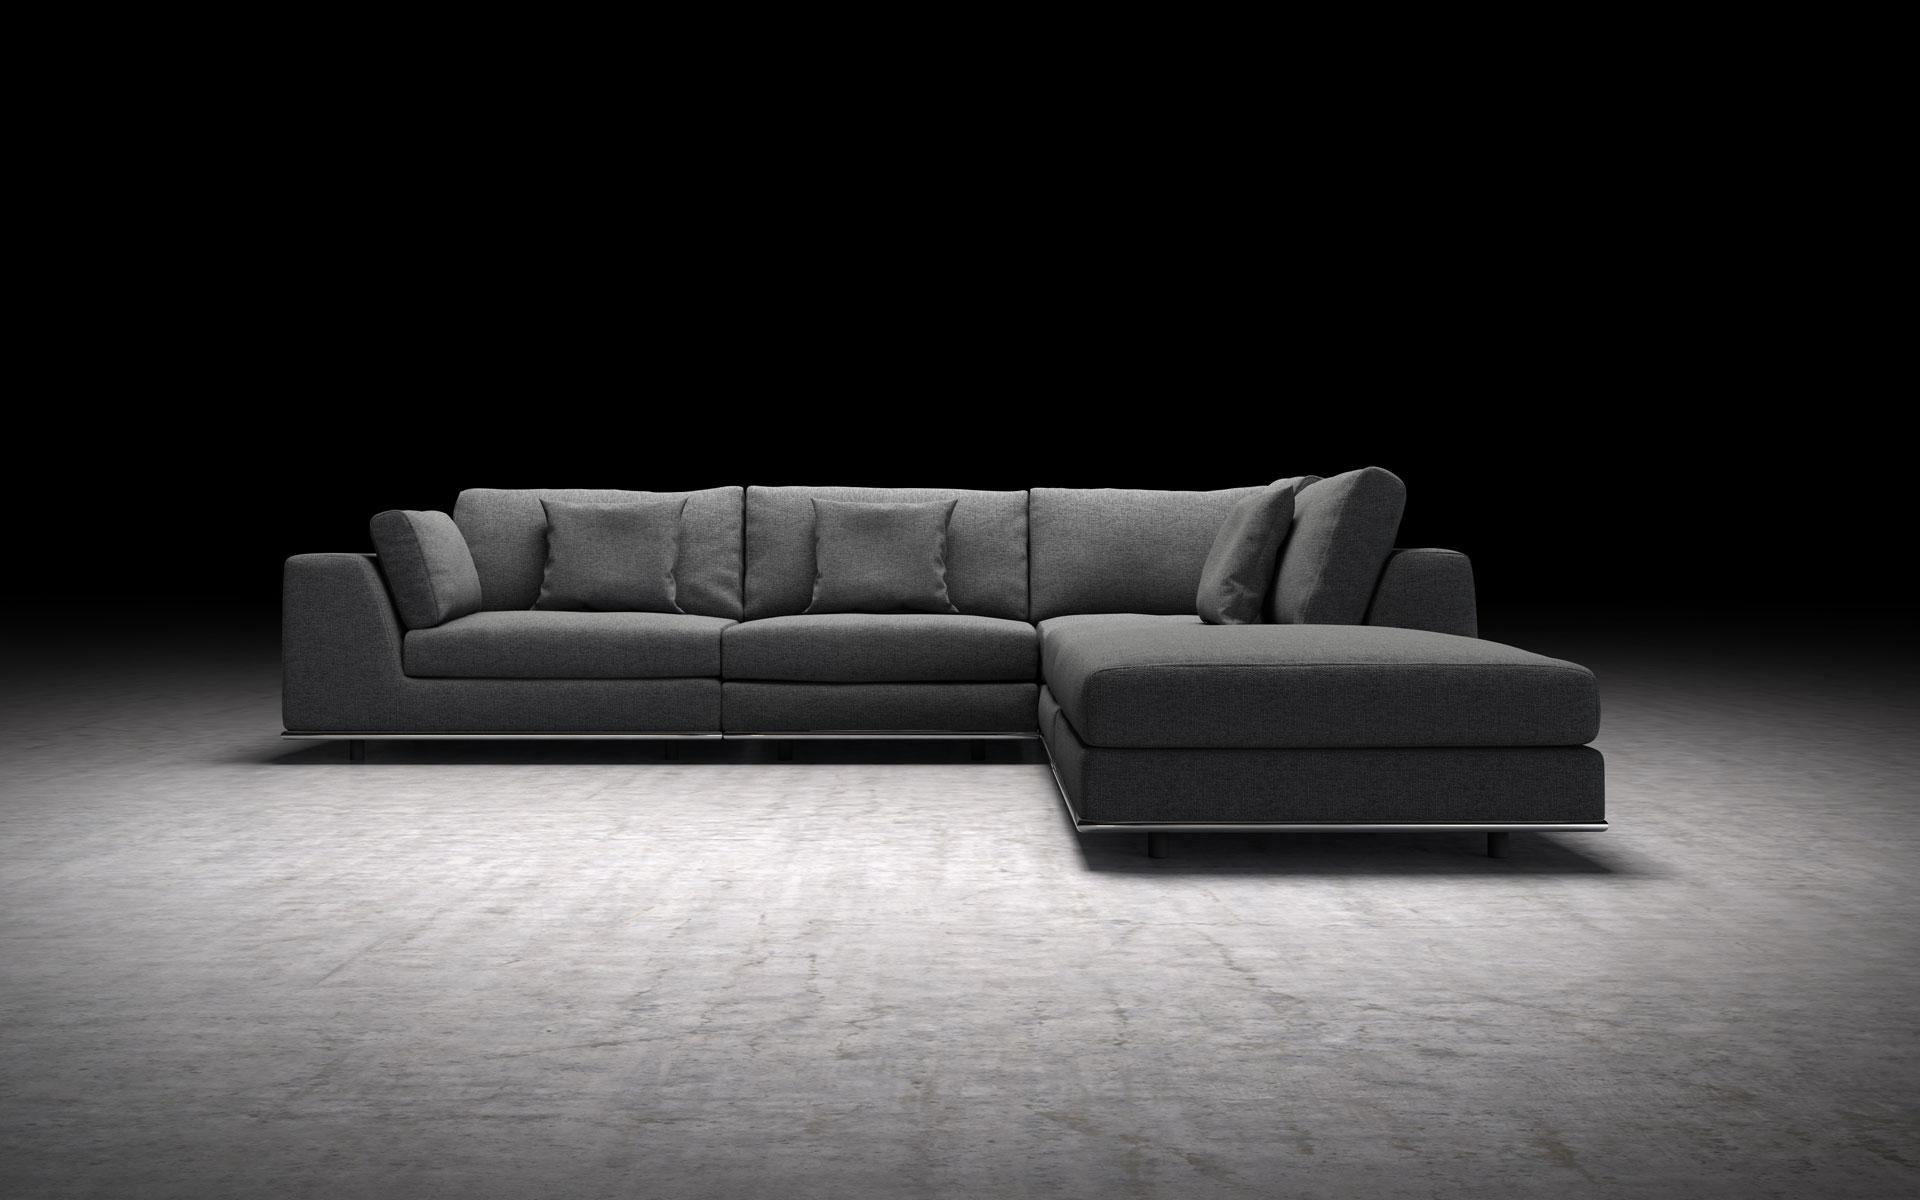 Perry 1 Arm Corner Sectional Sofa Shadow Gray by Modloft